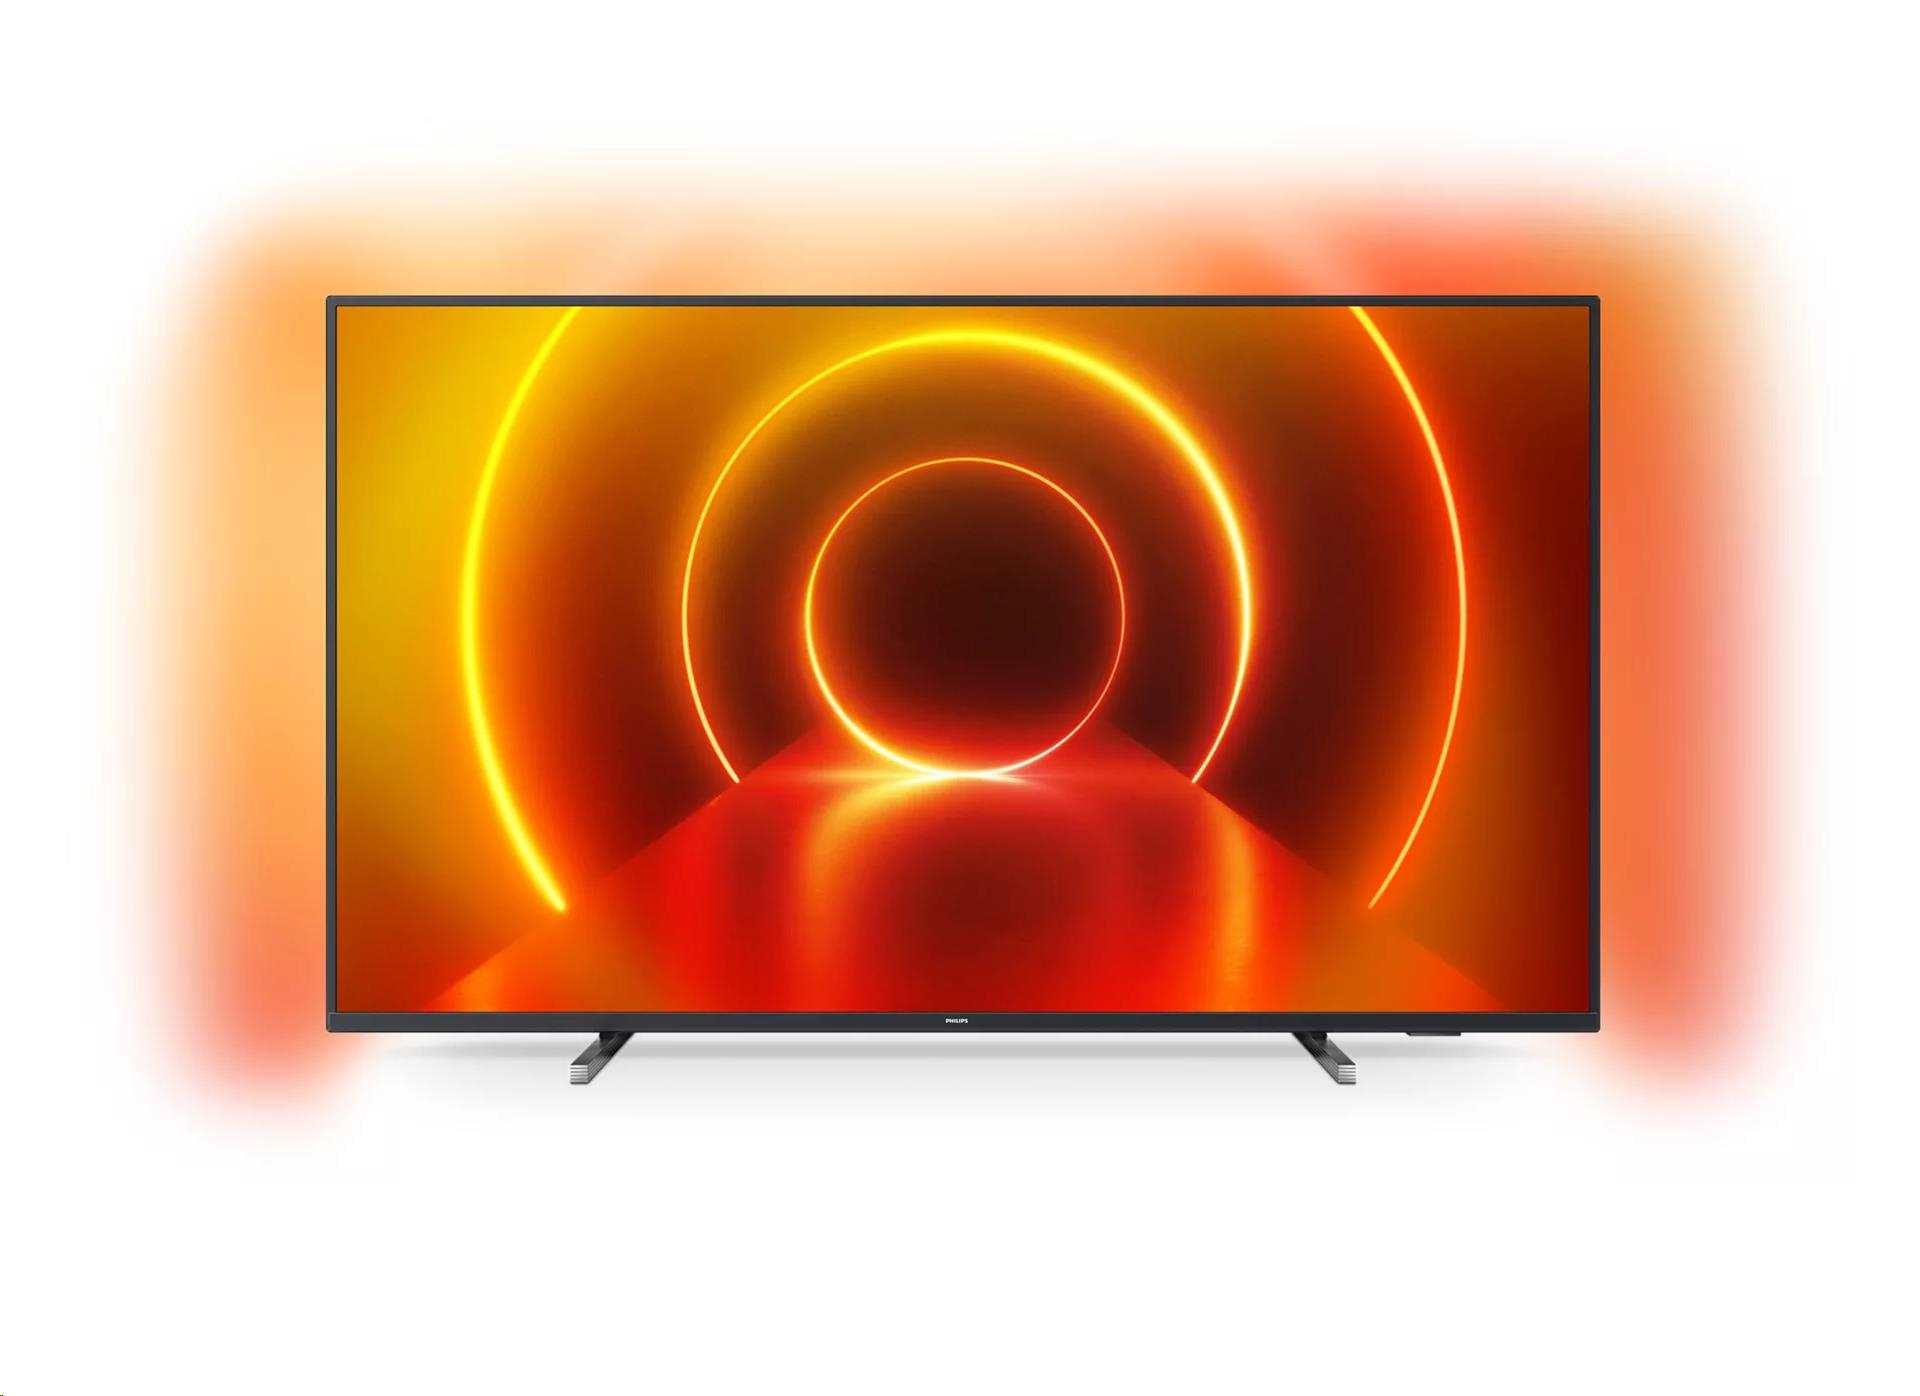 Philips TV LED Smart 4K UHD 50PUS7805/12, 50PUS7805/12